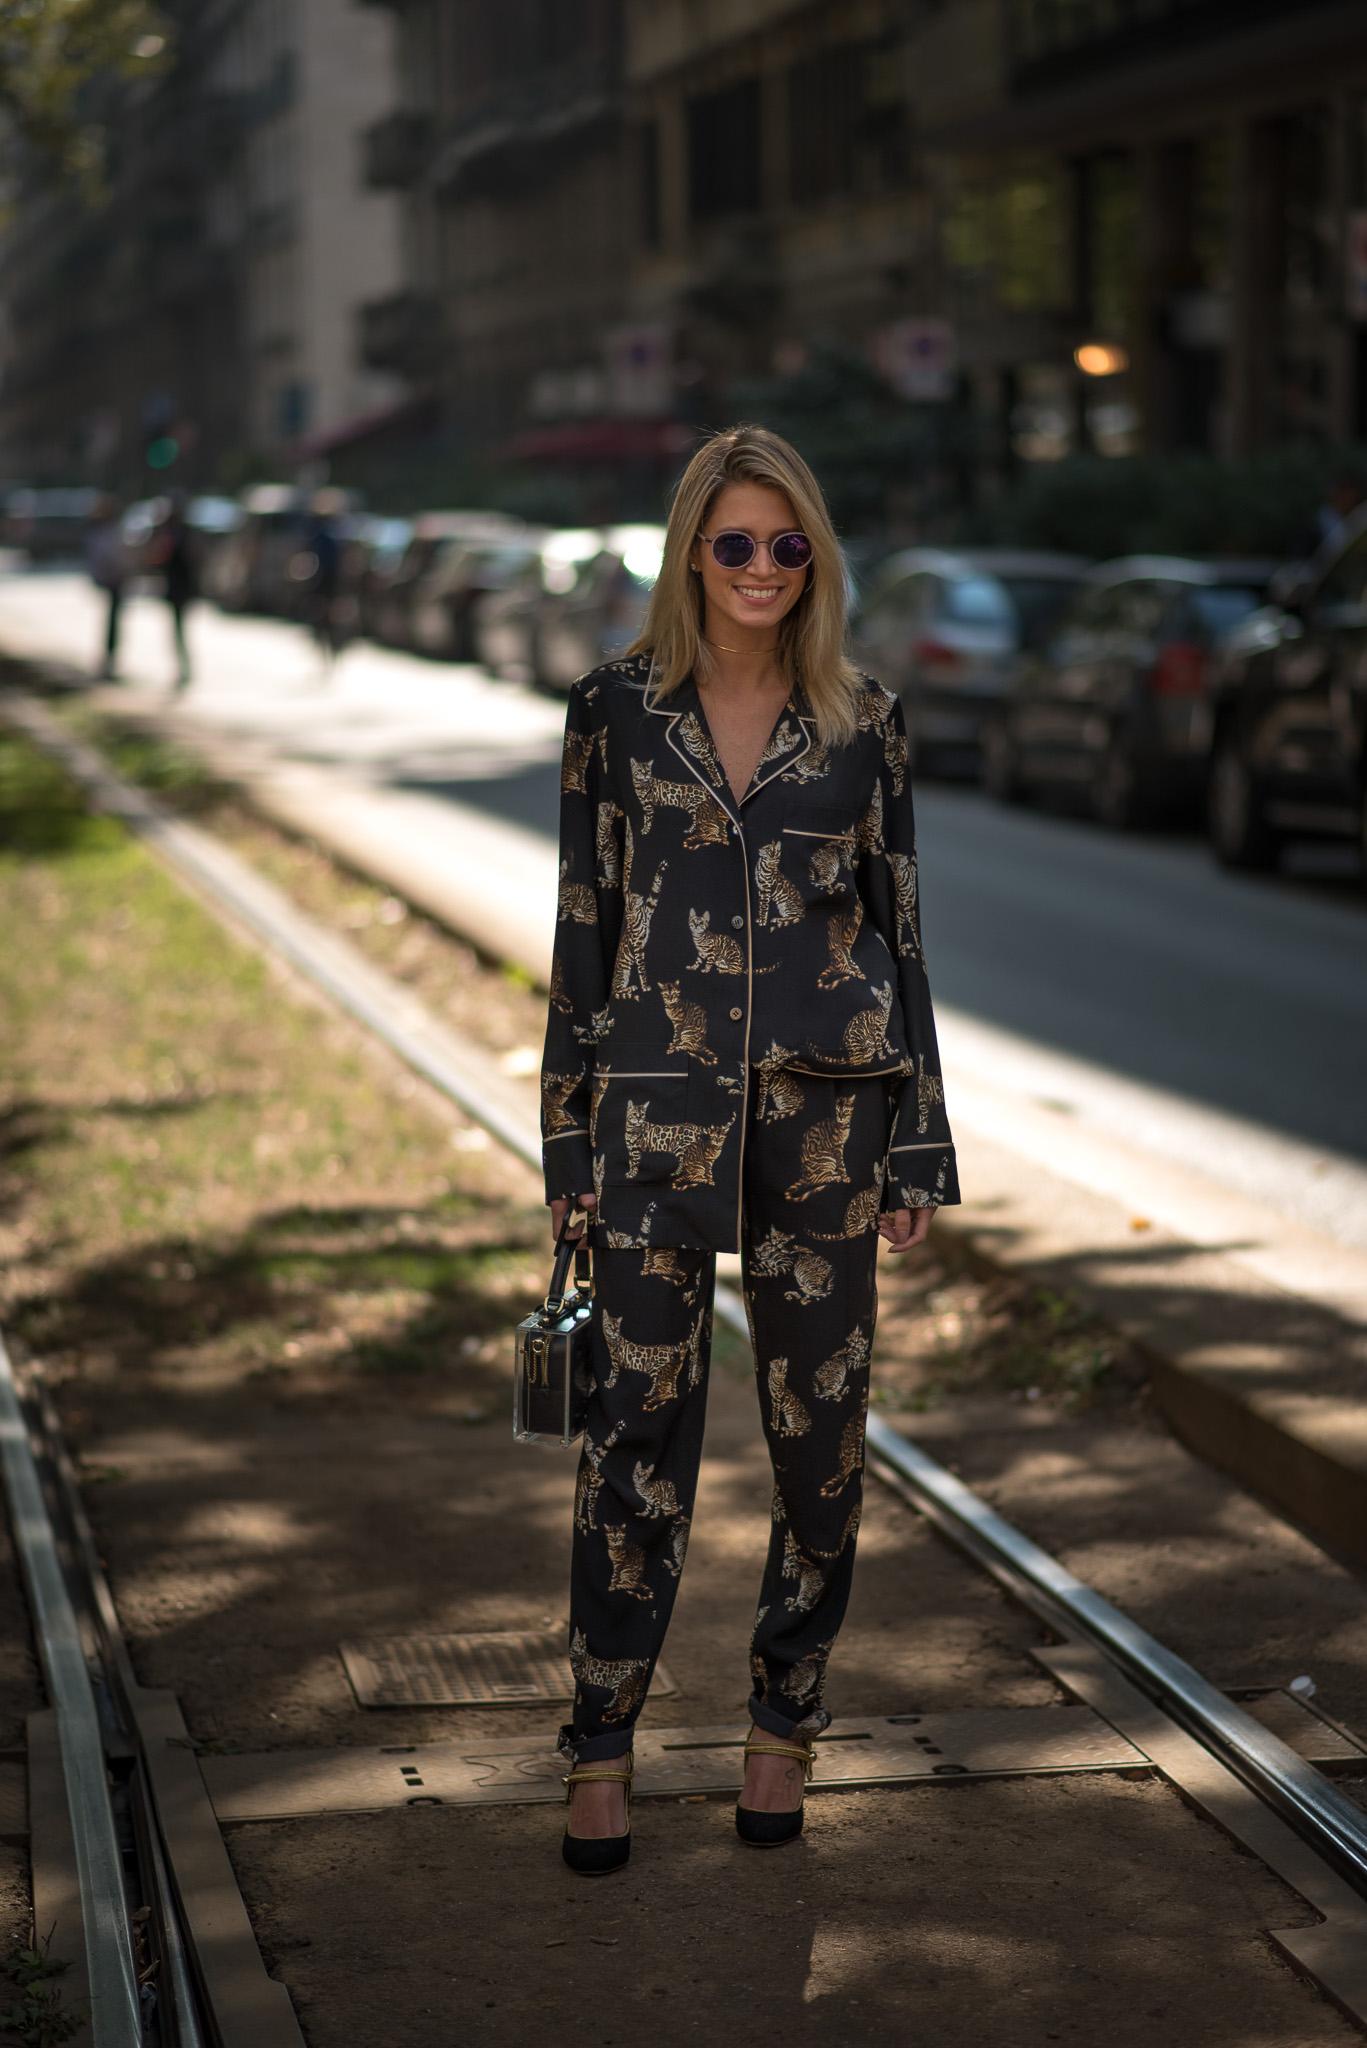 helena-bordon_dolce-gabbana_milan-fashion-week_sept-2016_photography-annika-lagerqvist_www-annikasomething-com-2